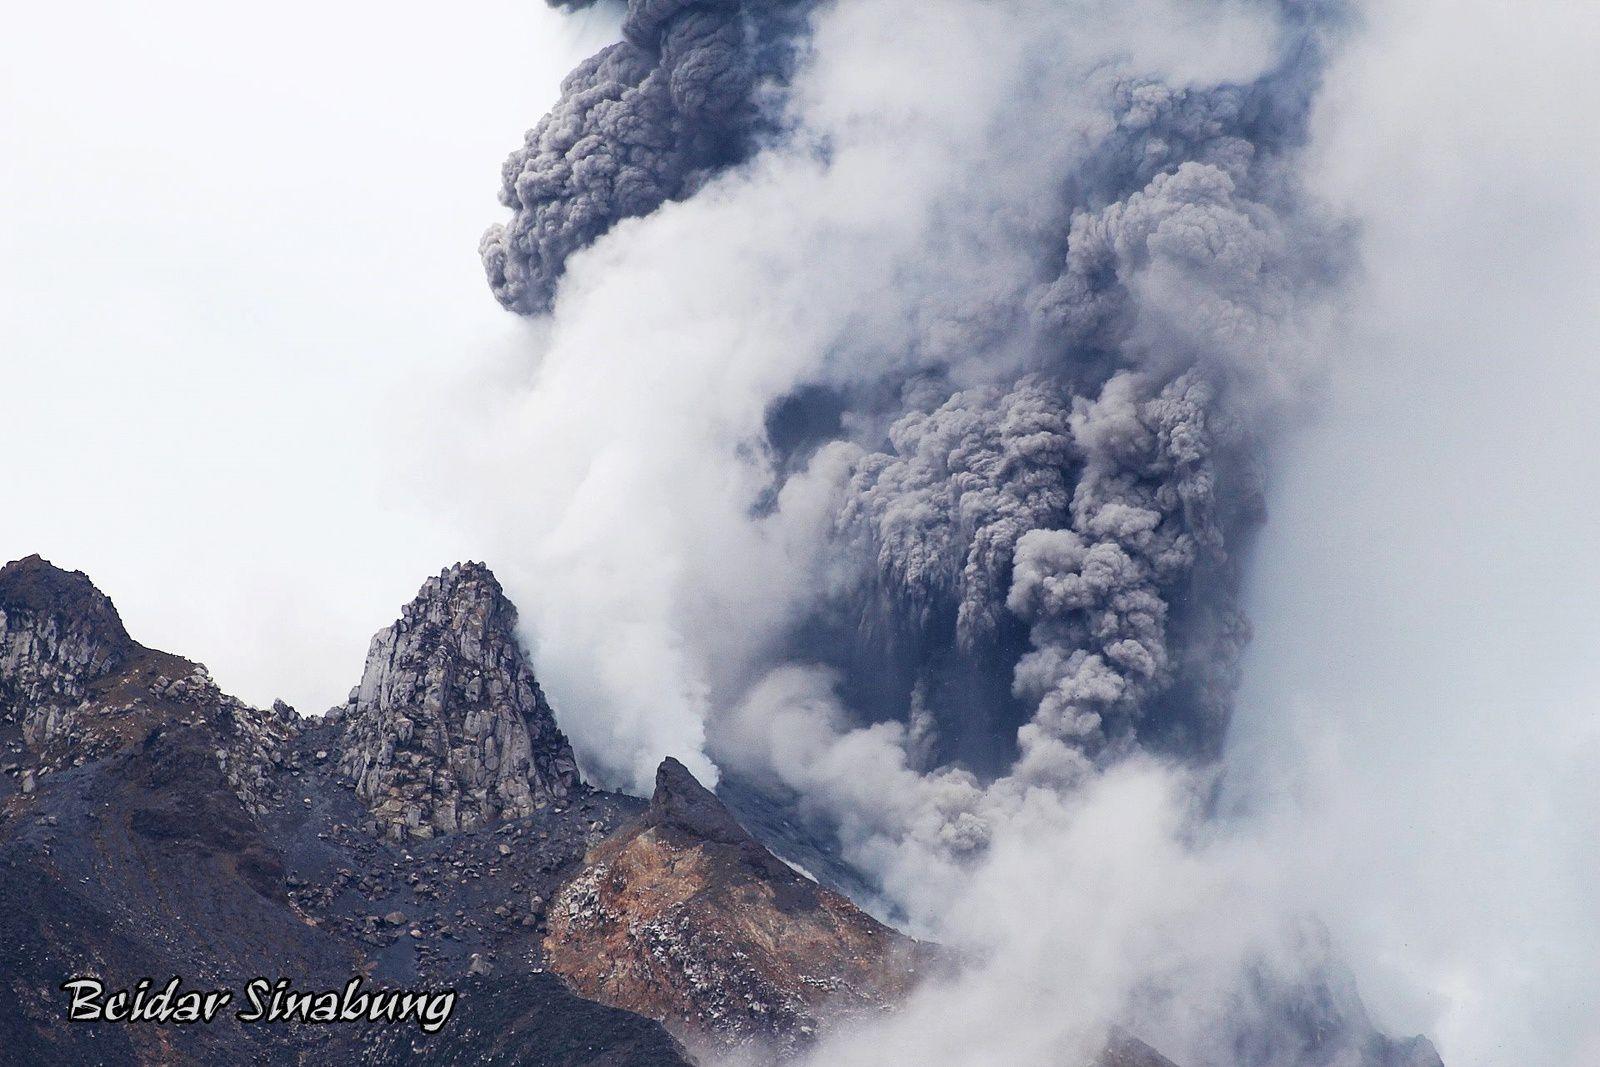 Sinabung - 27.09.2017 /  13h23 Wib  - photo Firdaus Surbakti via Komunitas Beidar Sinabung